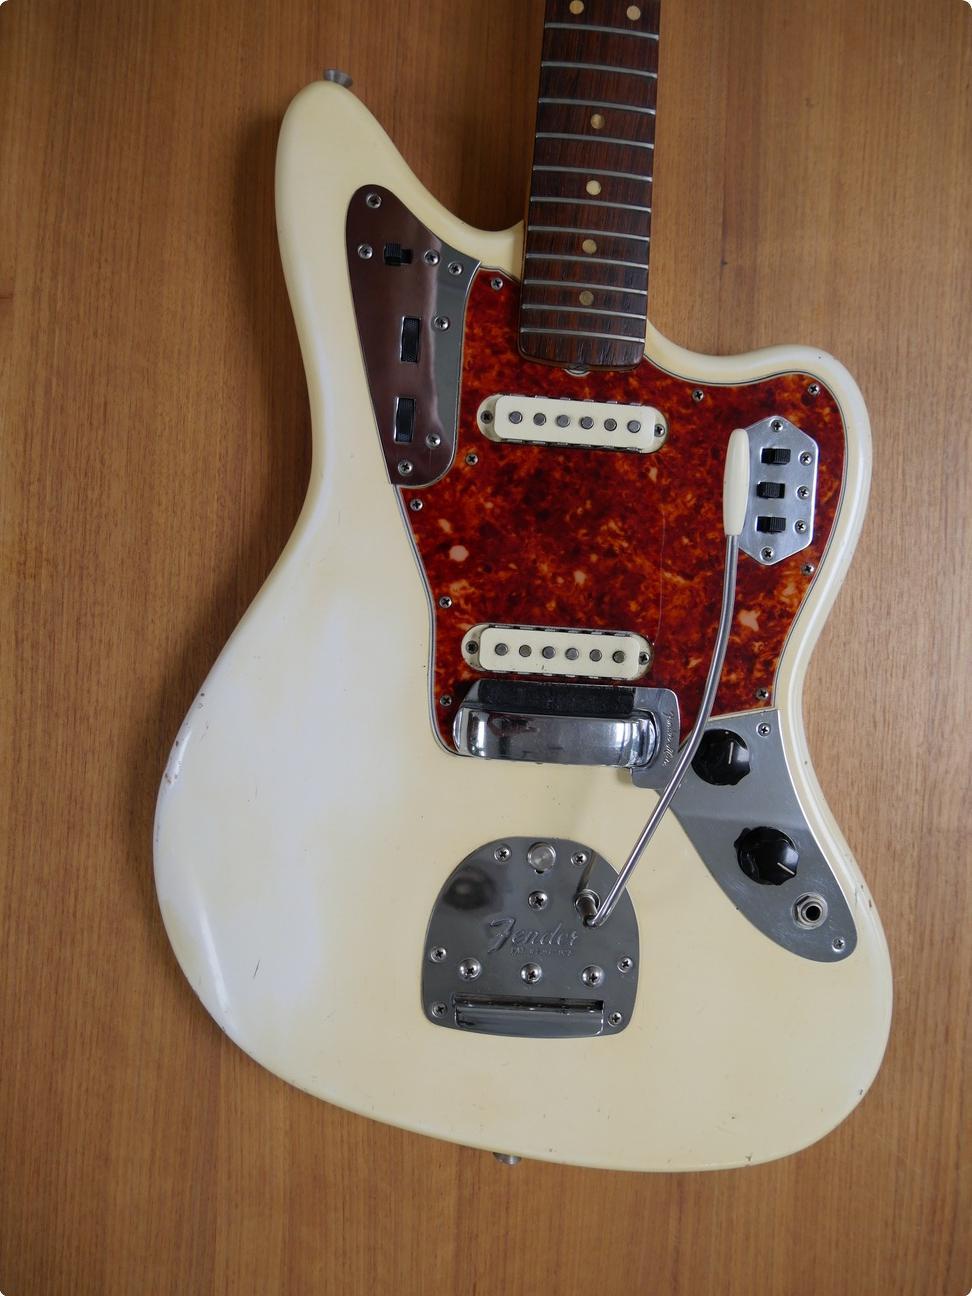 Fender Jaguar Olympic White Best 2018 Johnny Marr Wiring Diagram At Gear4